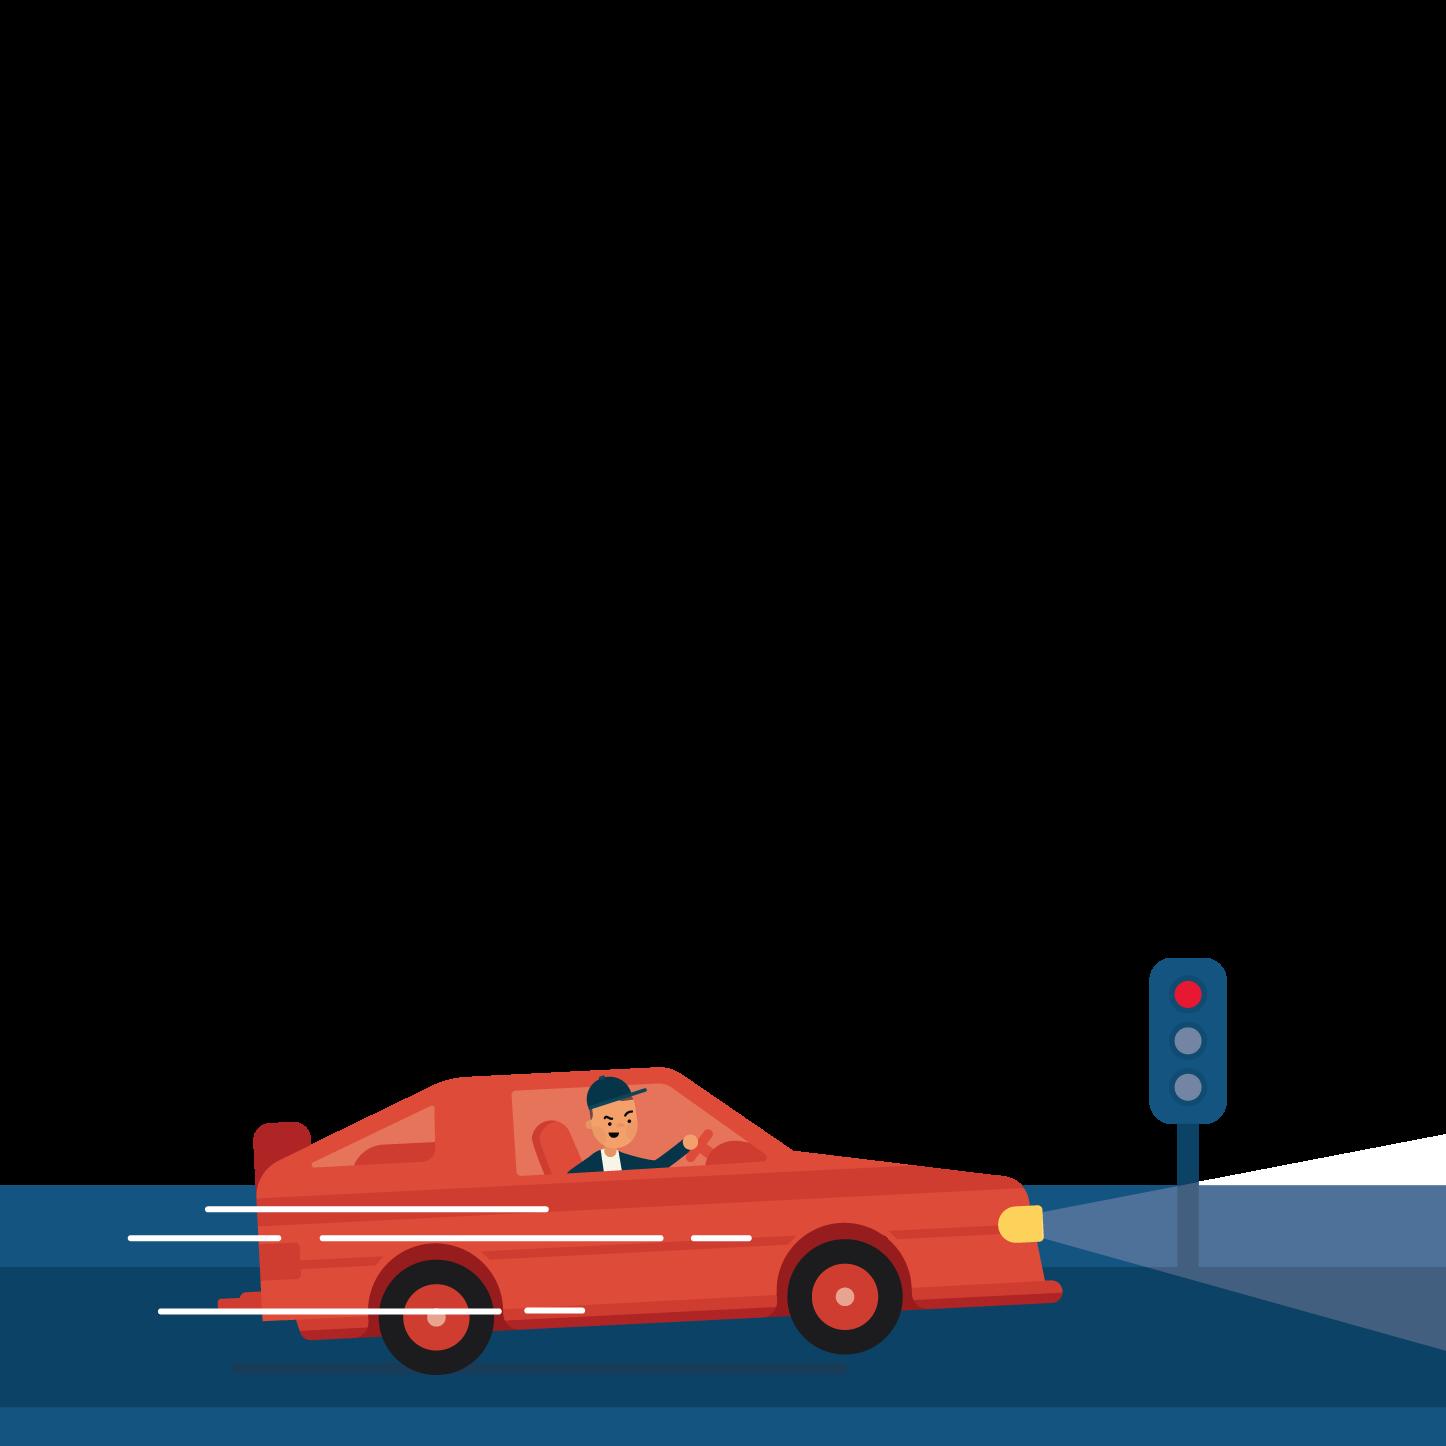 young driver speeding through a red light